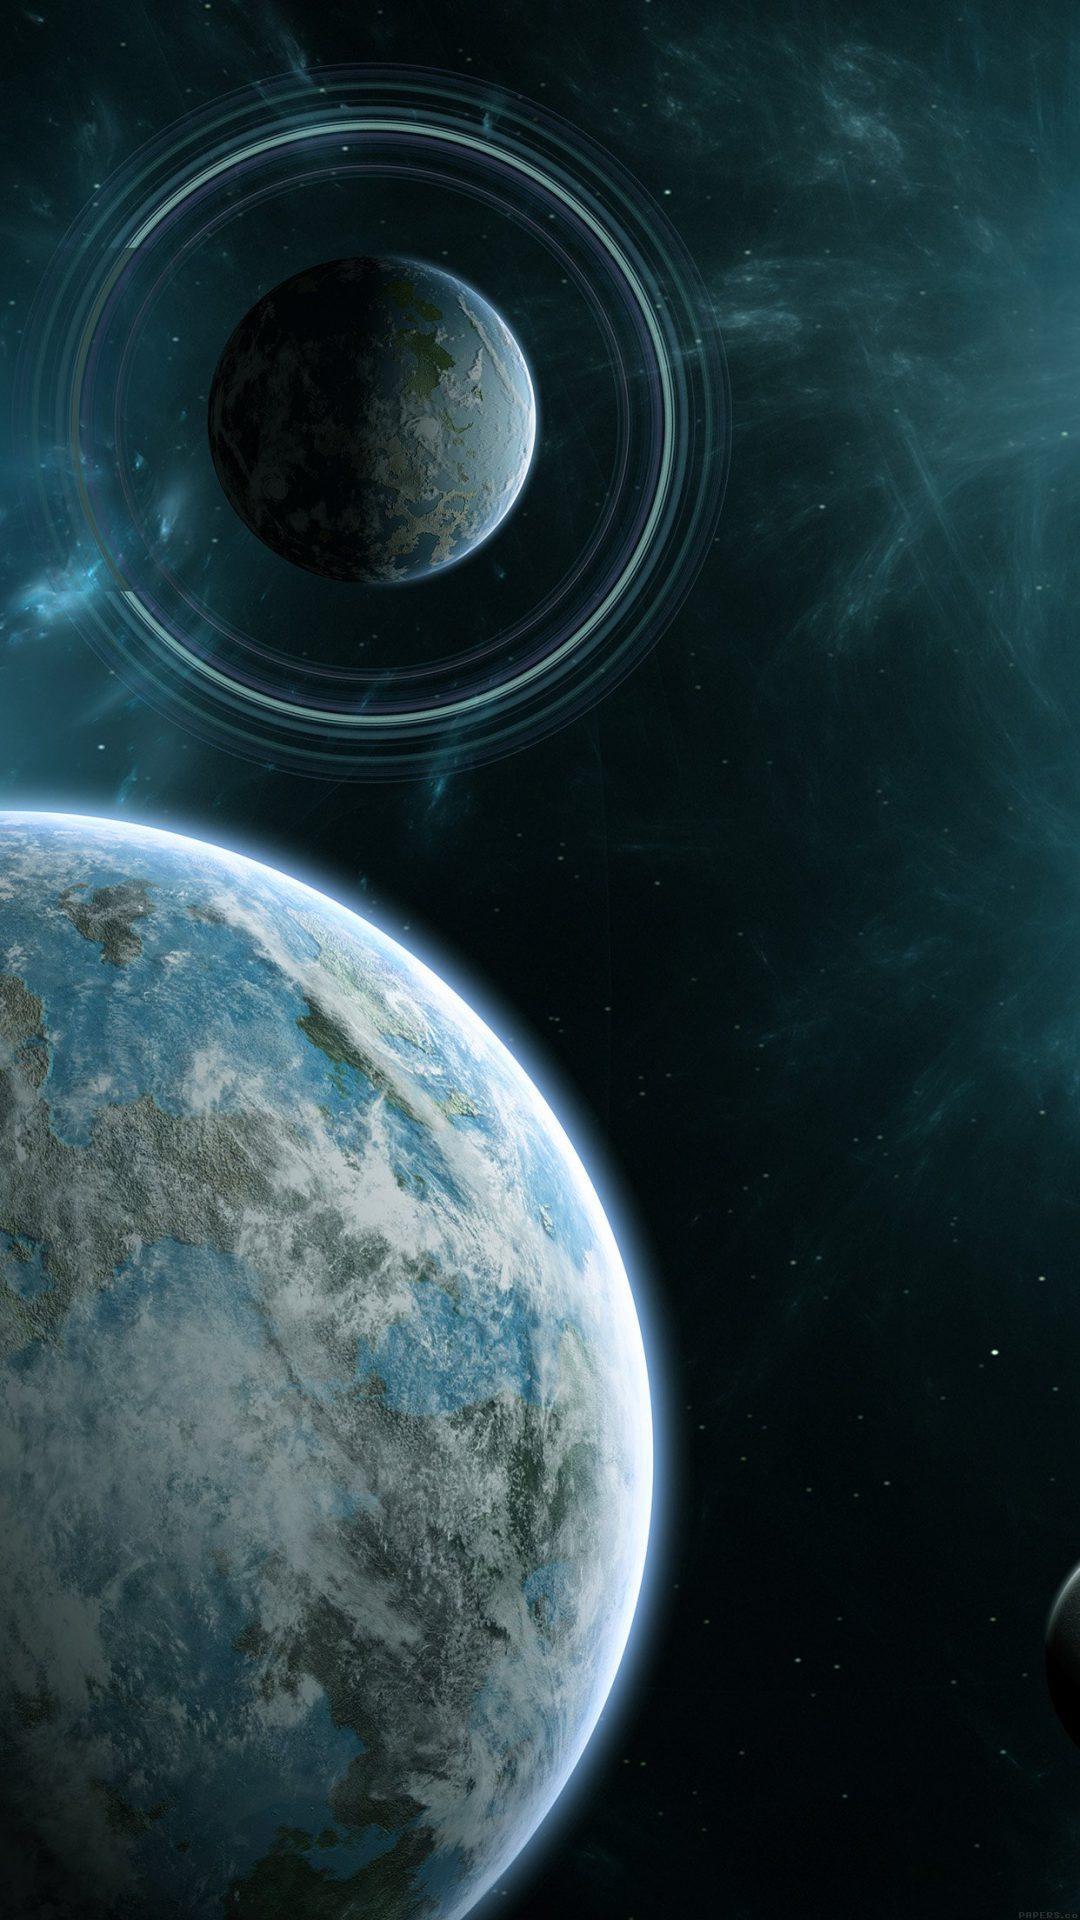 Planet Space Star Odyssey Art